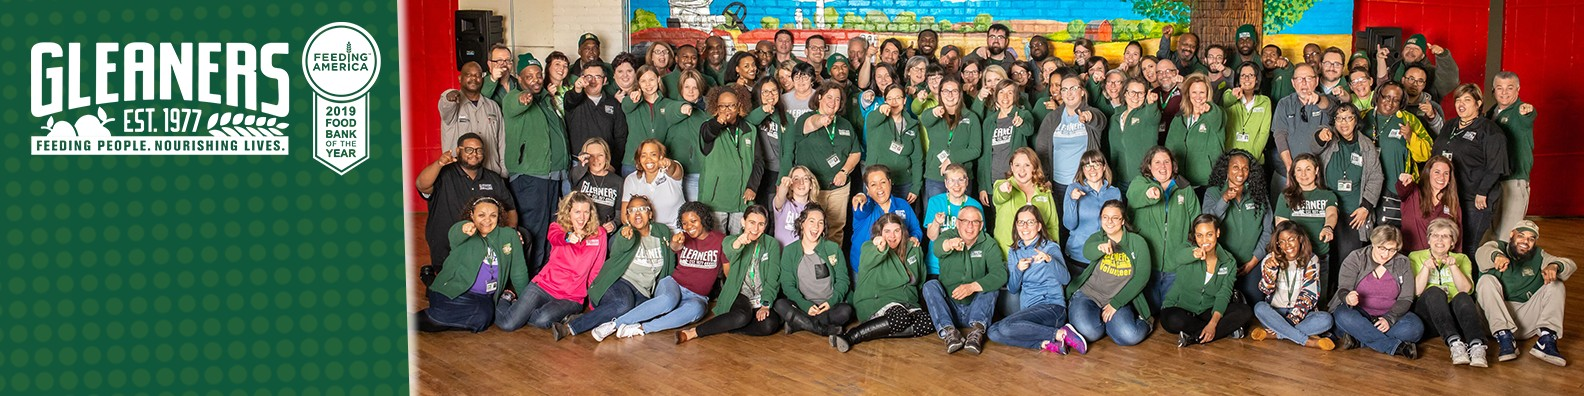 Gleaners Community Food Bank of Southeastern Michigan | LinkedIn